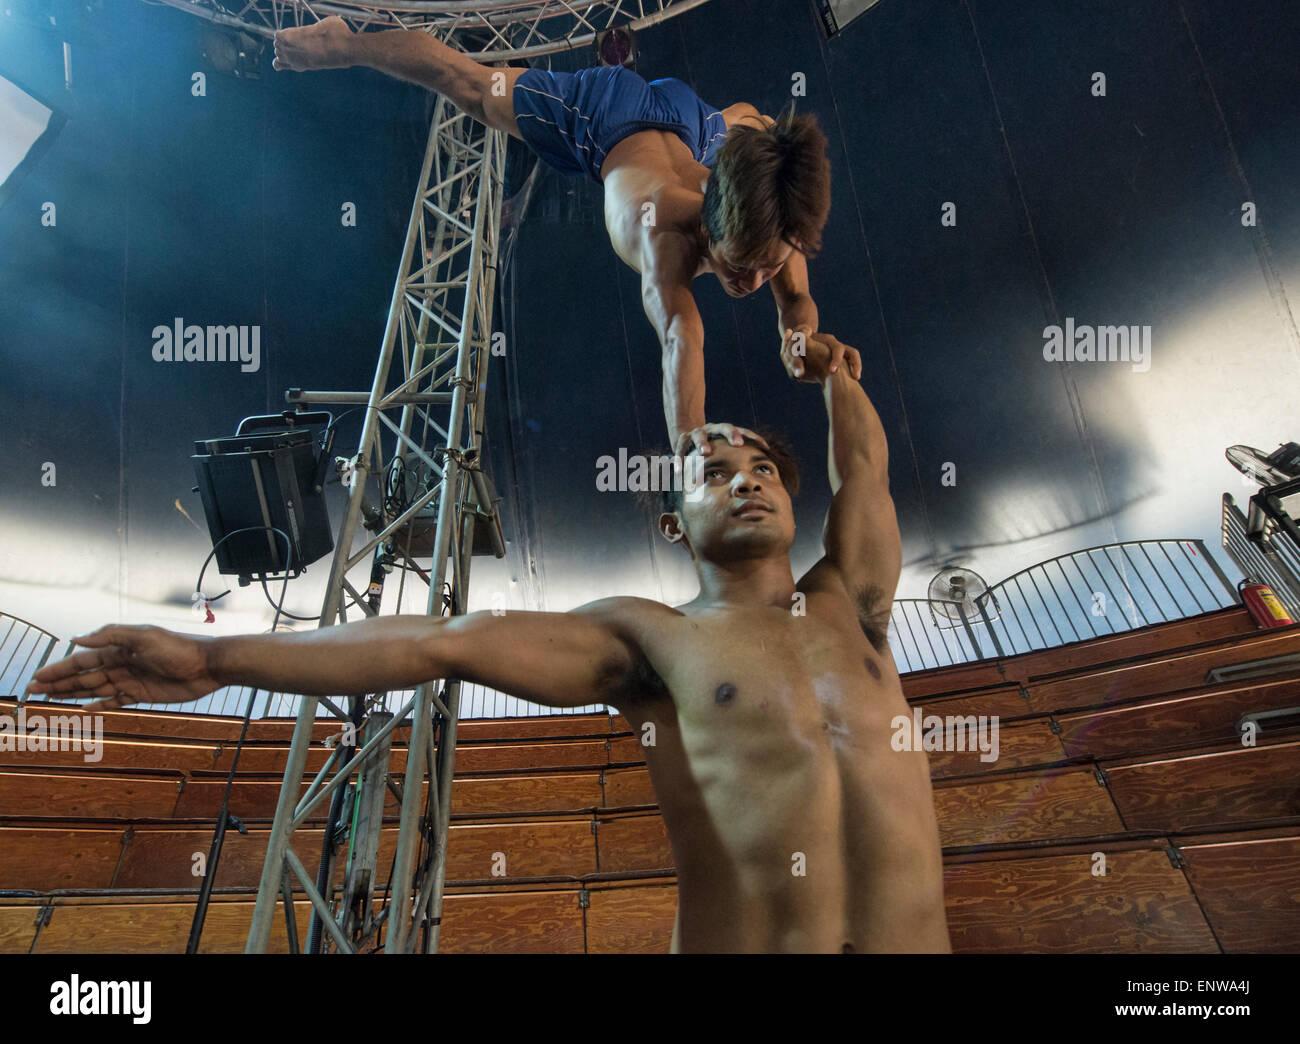 Akrobatisches Talent im Phare kambodschanische Zirkus, Siem Reap, Kambodscha Stockbild